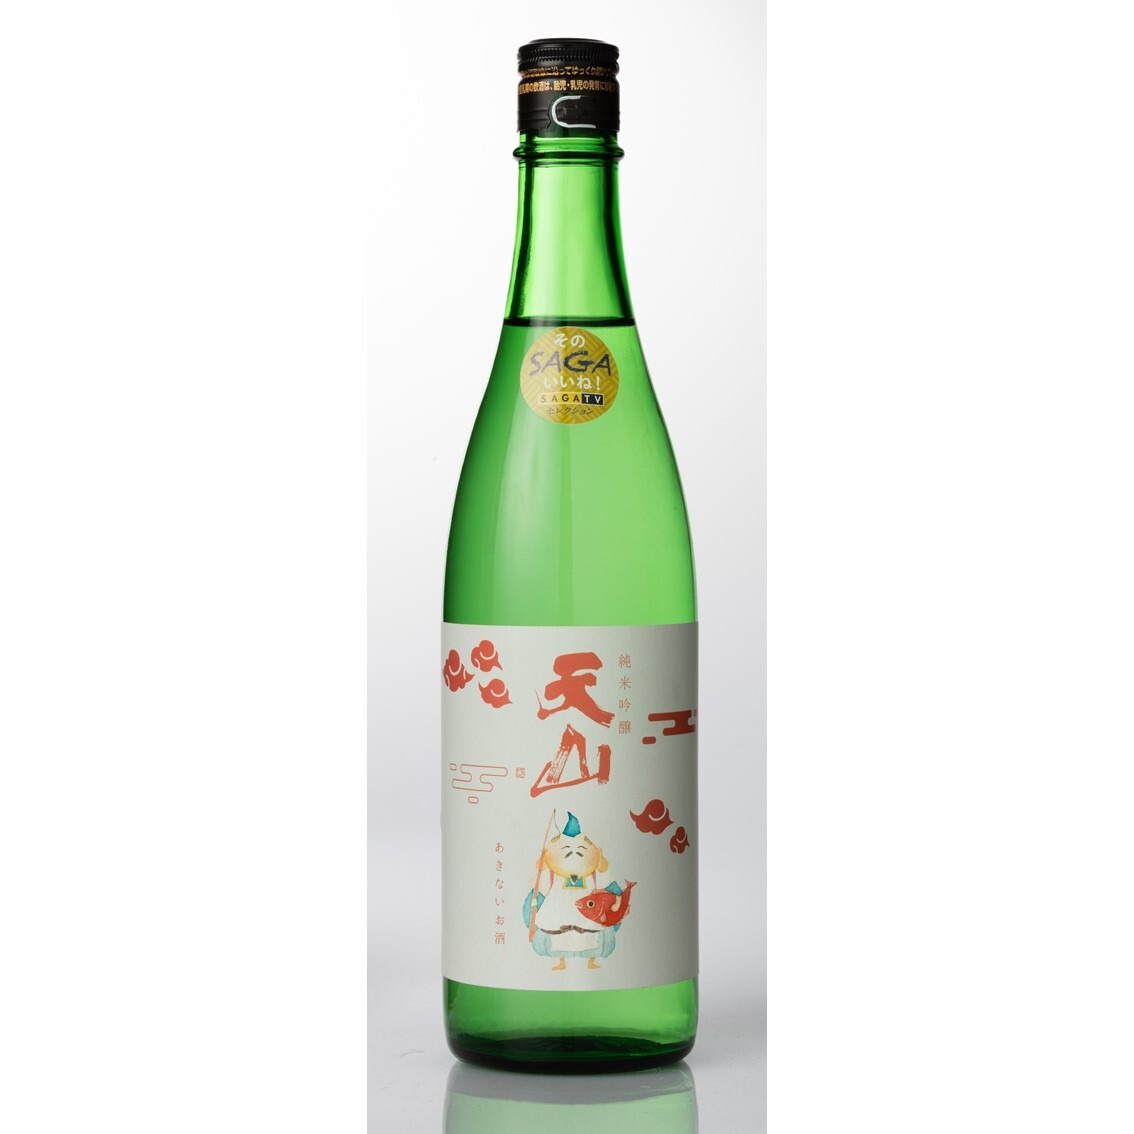 天山 純米吟醸恵比寿ラベル 720ml